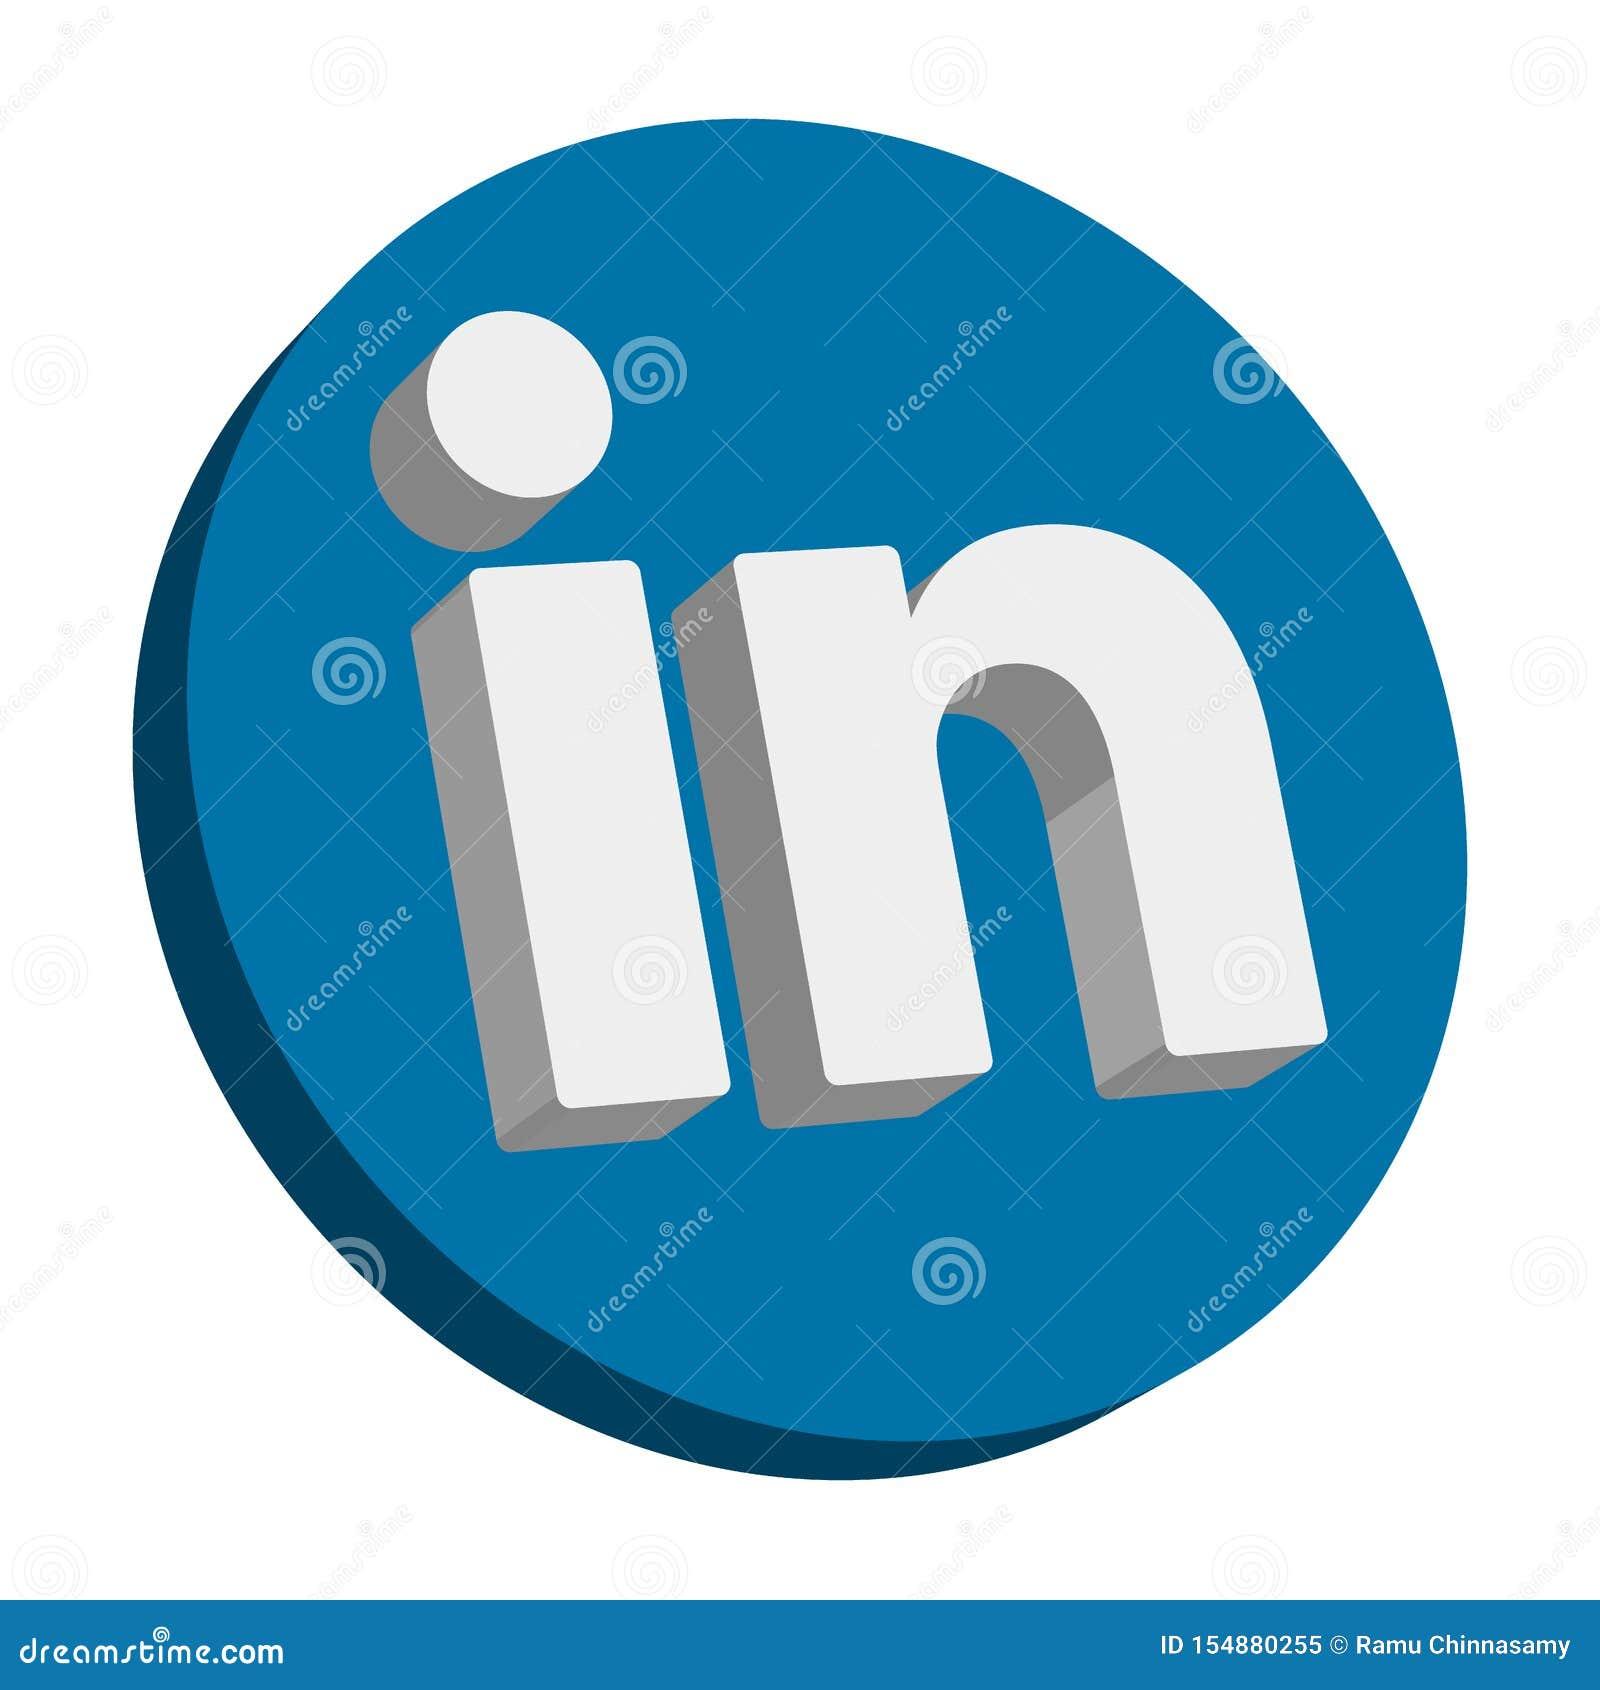 Linkedin Editorial Image Illustration Of Here Clip 154880255